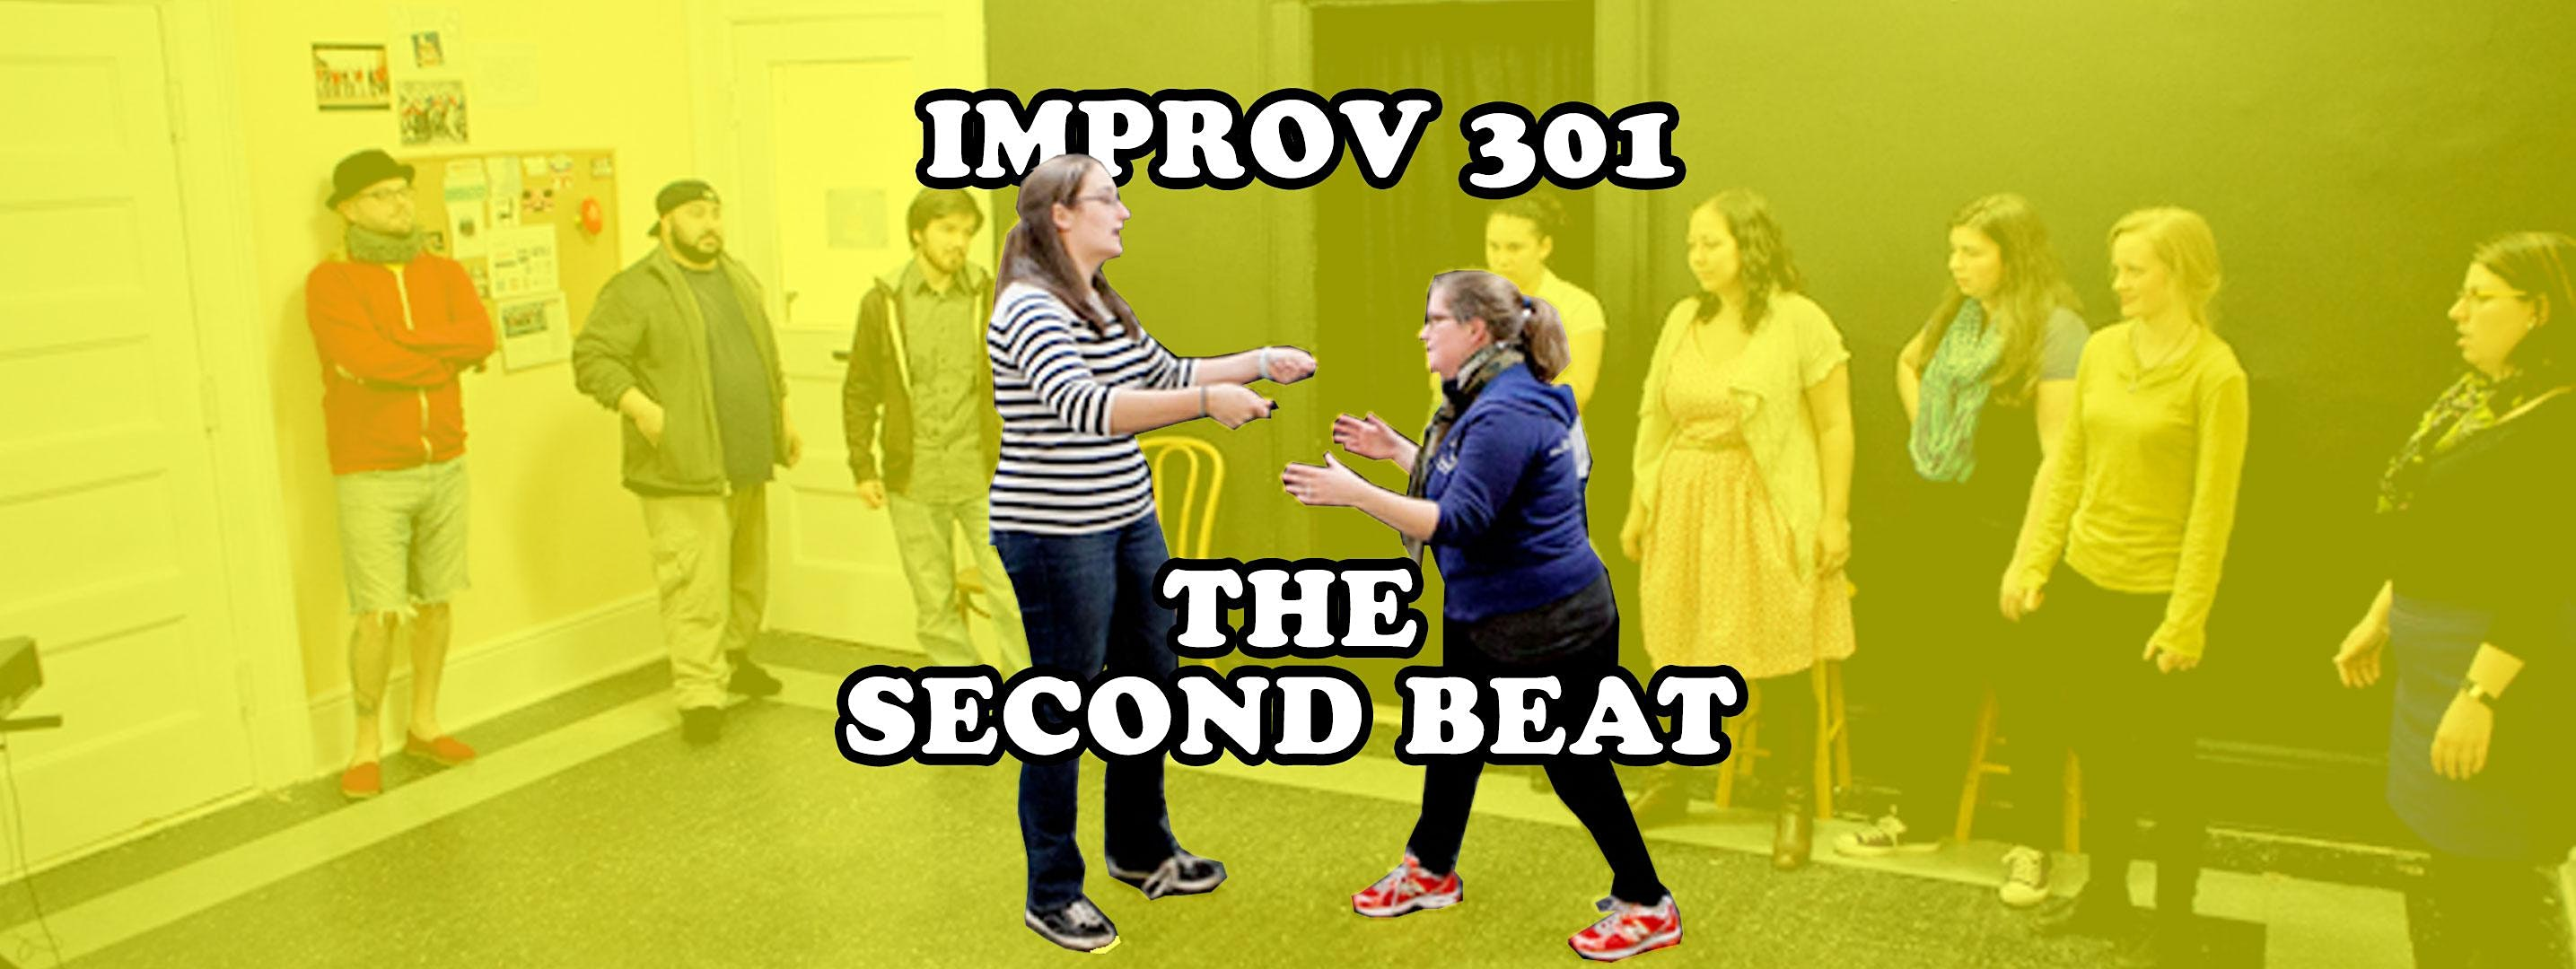 Improv 301: The Second Beat